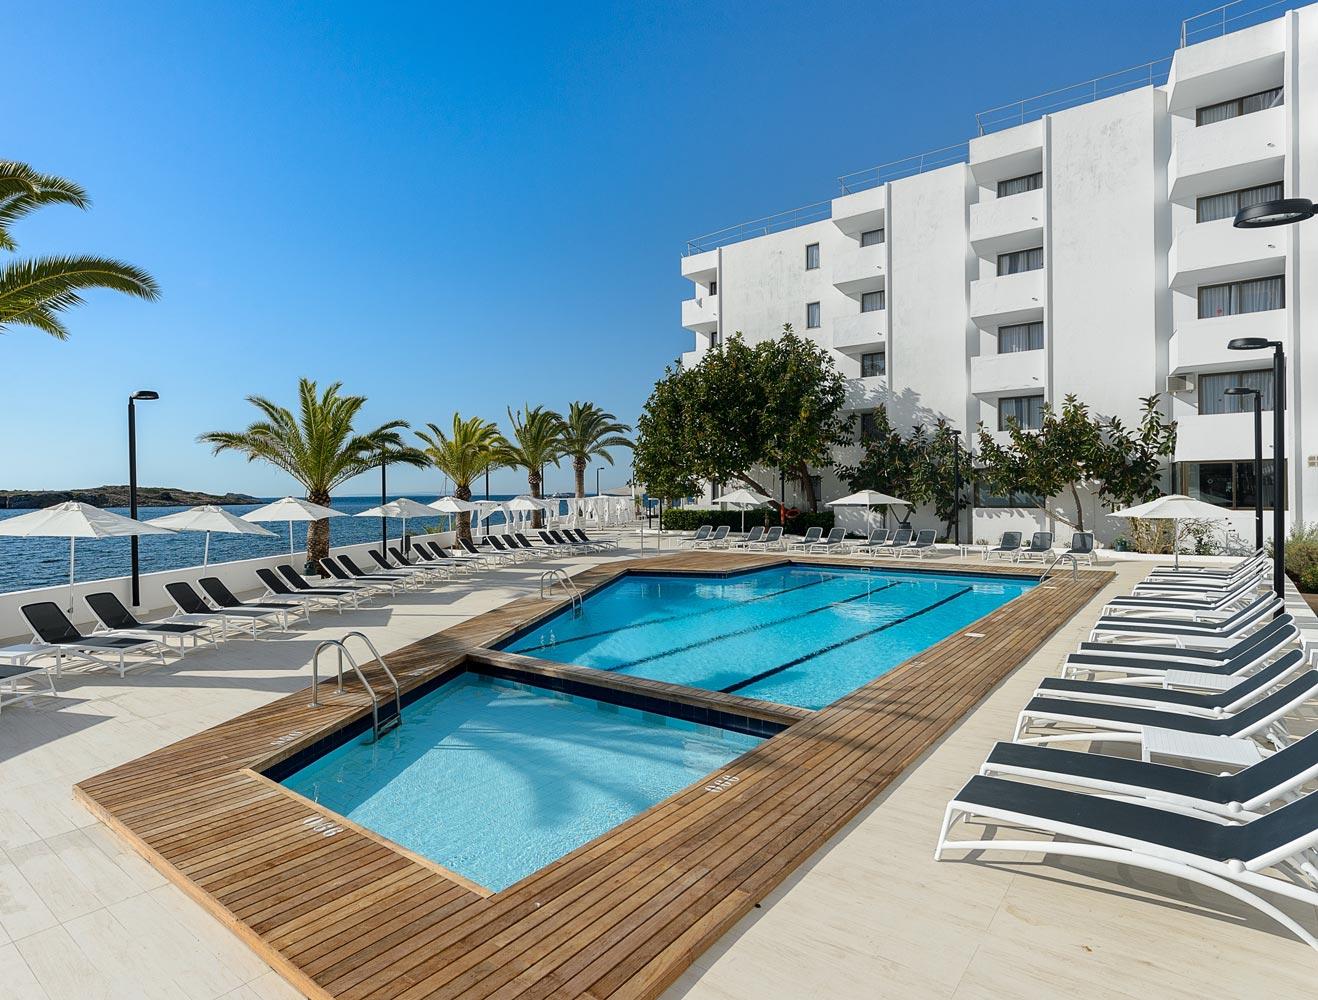 Fotografo hotel en Ibiza22